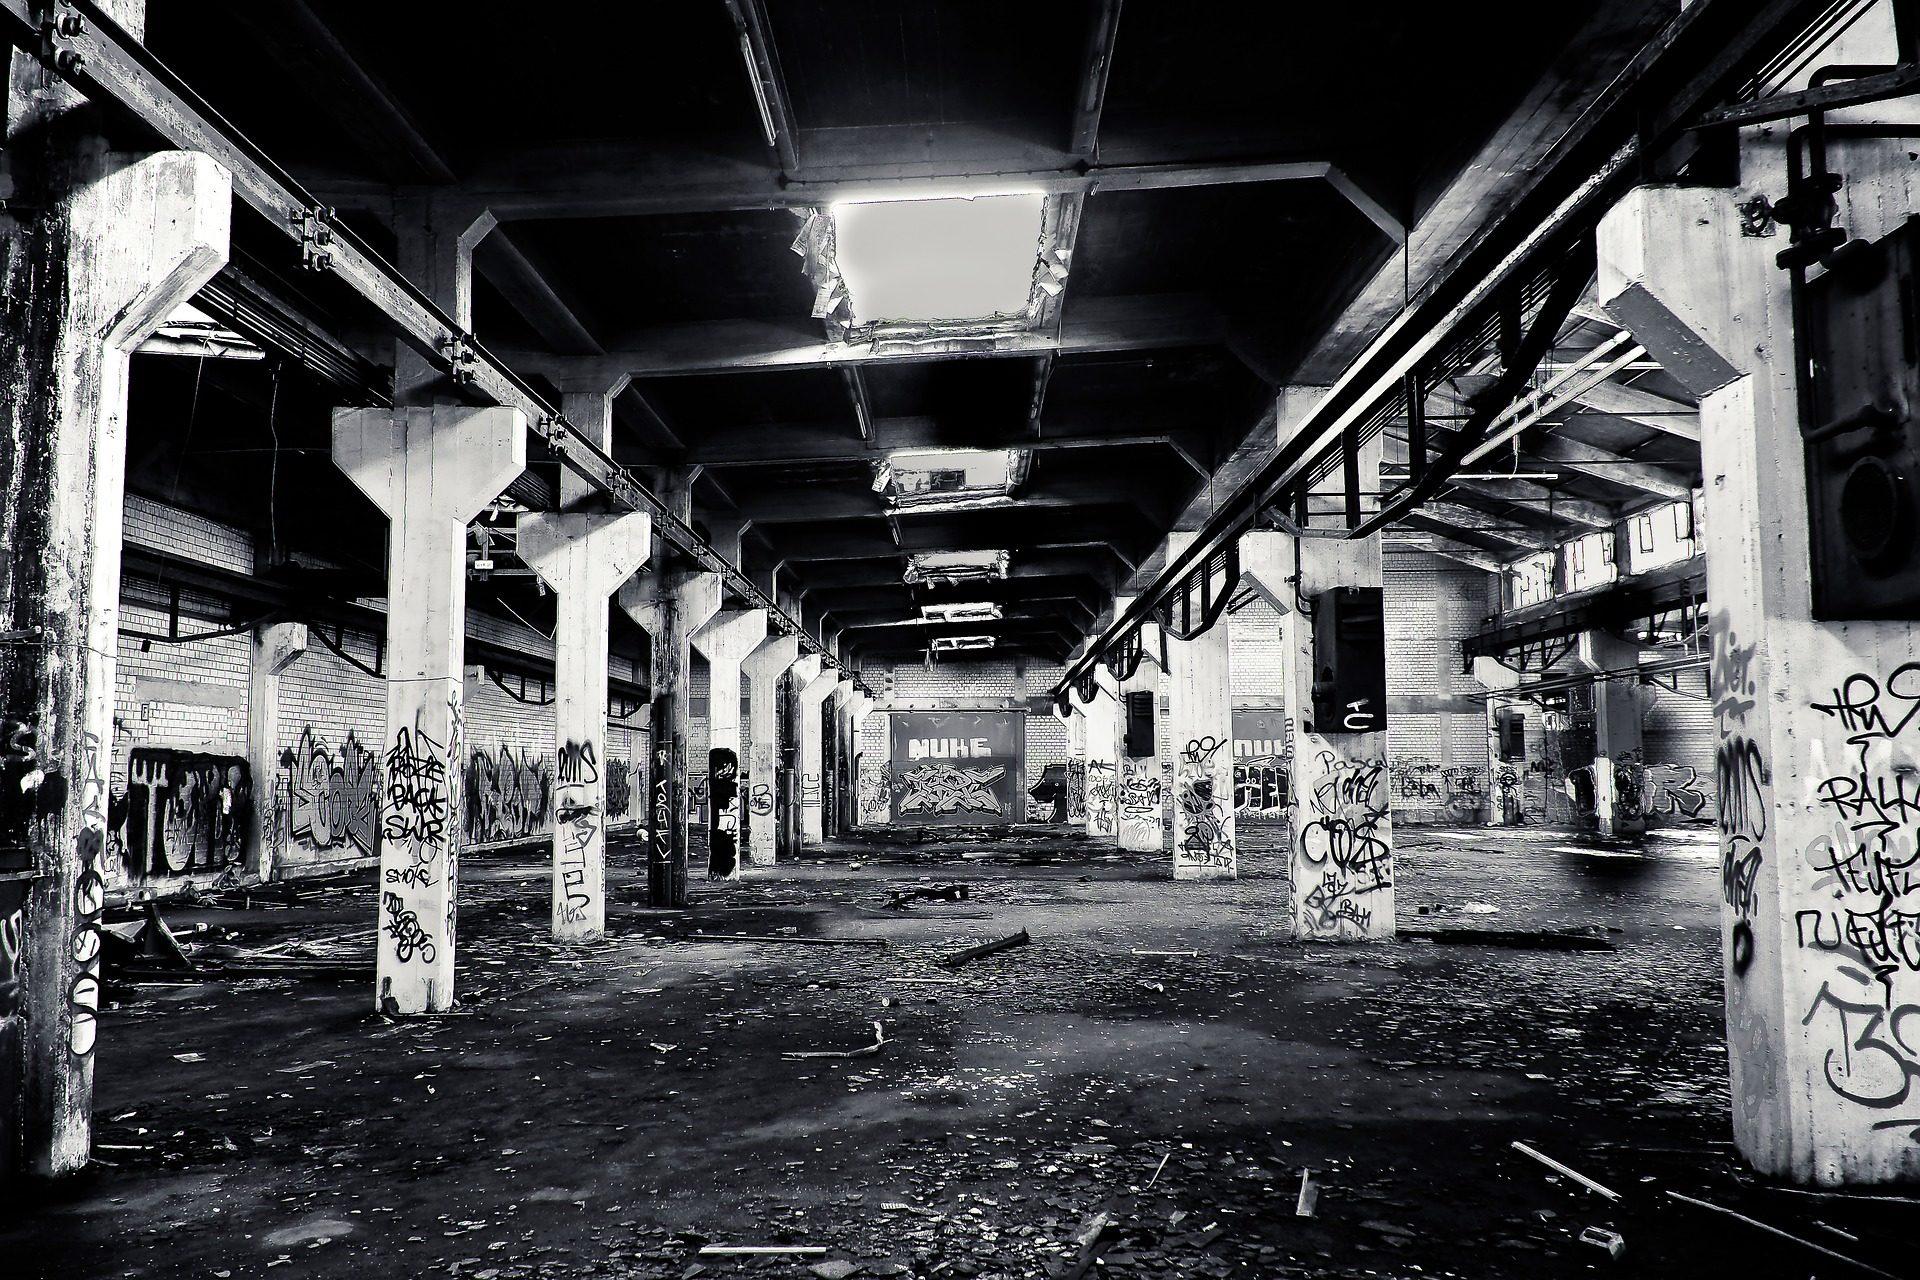 Fondo De Pantalla De Edificio Arquitectura Viejo Abandonado